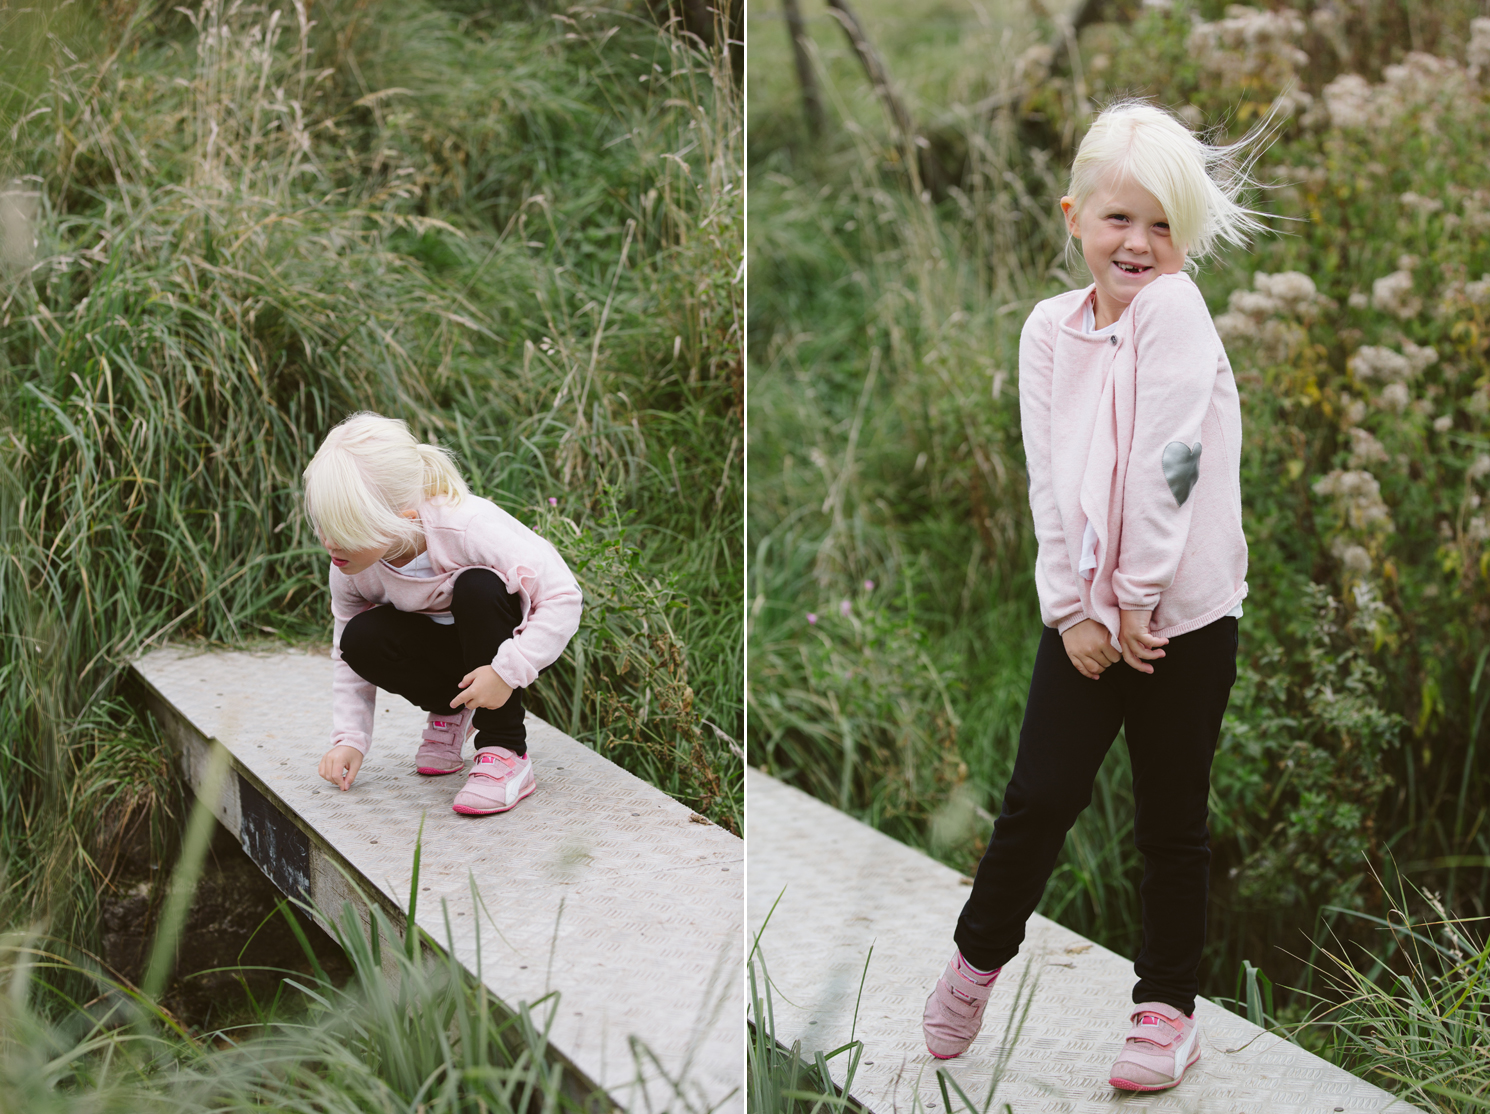 familjefotografering-barn-syskonfotografering-lillebror-storasyster-maria-o-photo-klagerup-3